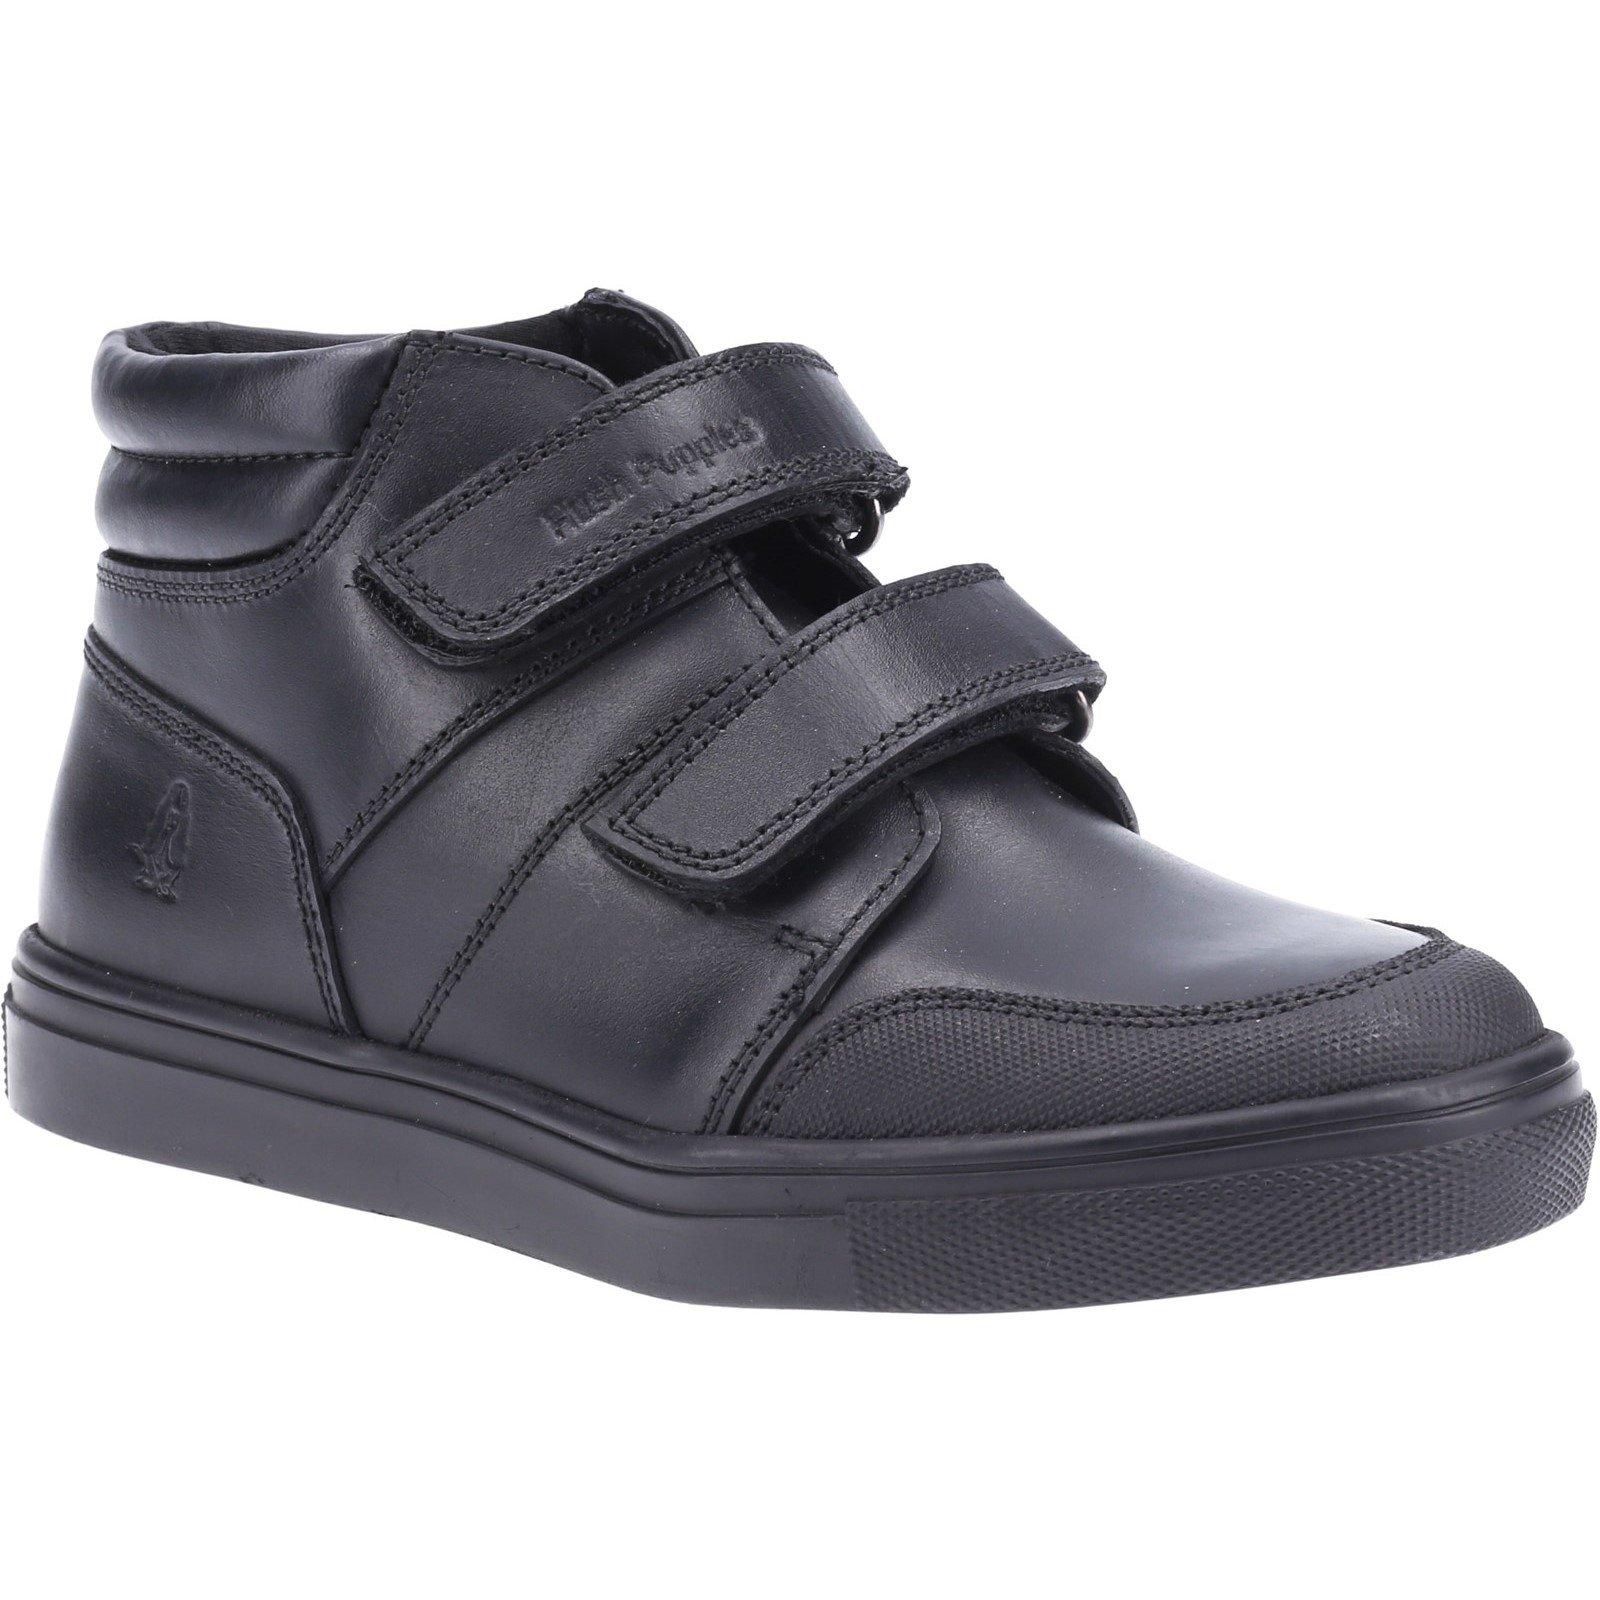 Hush Puppies Kid's Seth Senior School Boot Black 32570 - Black 3